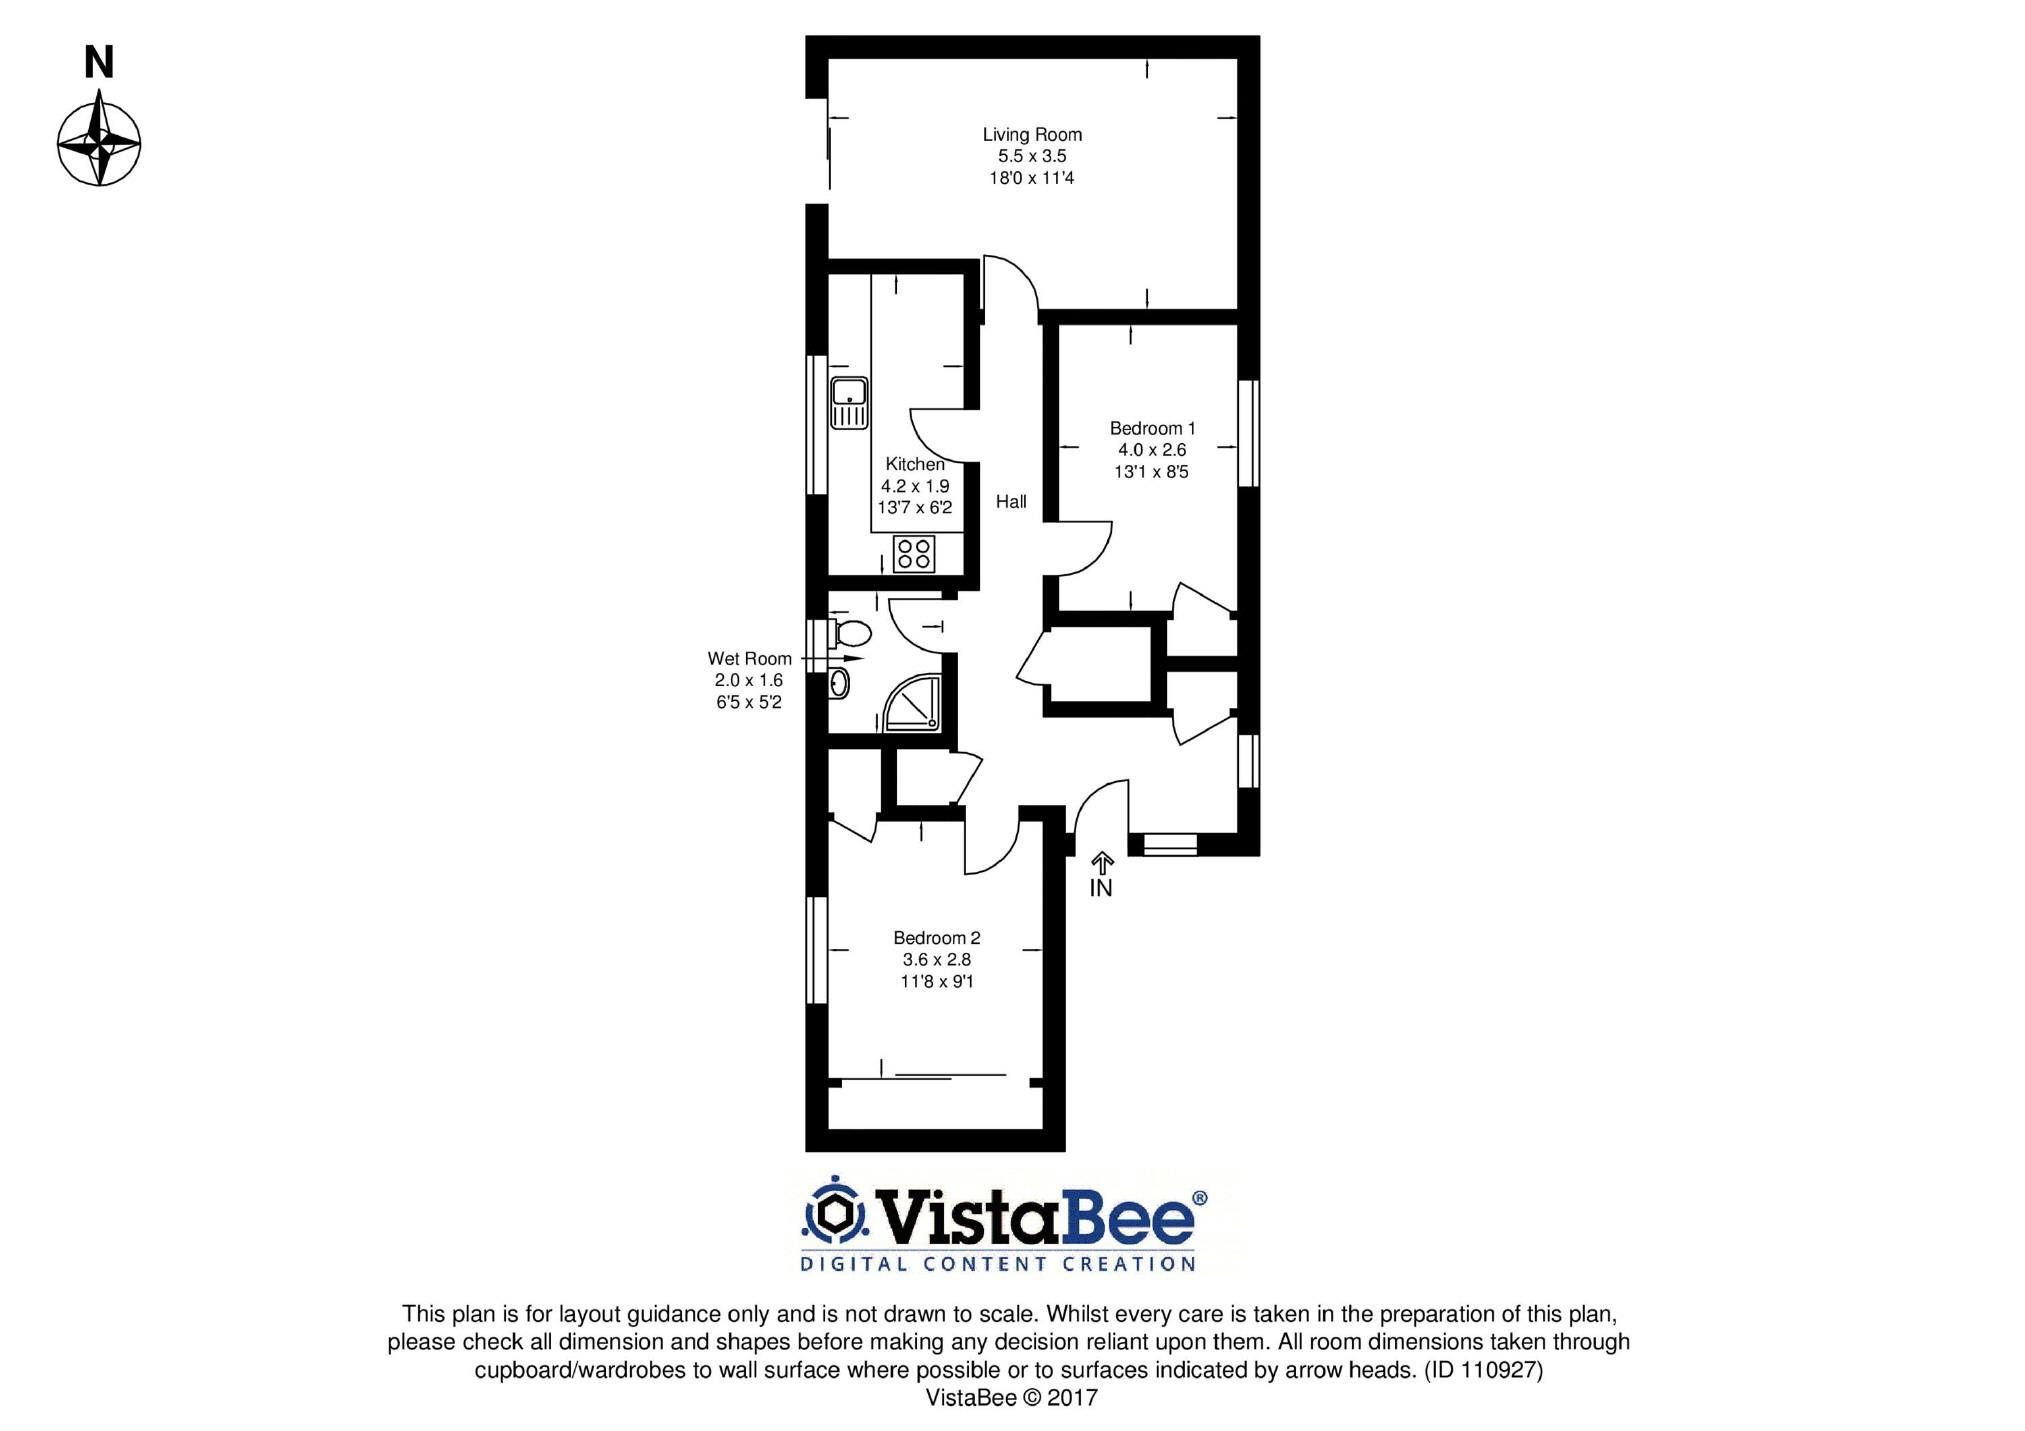 97 Gillway Rosyth Ky11 2 Bedroom Flat For Sale